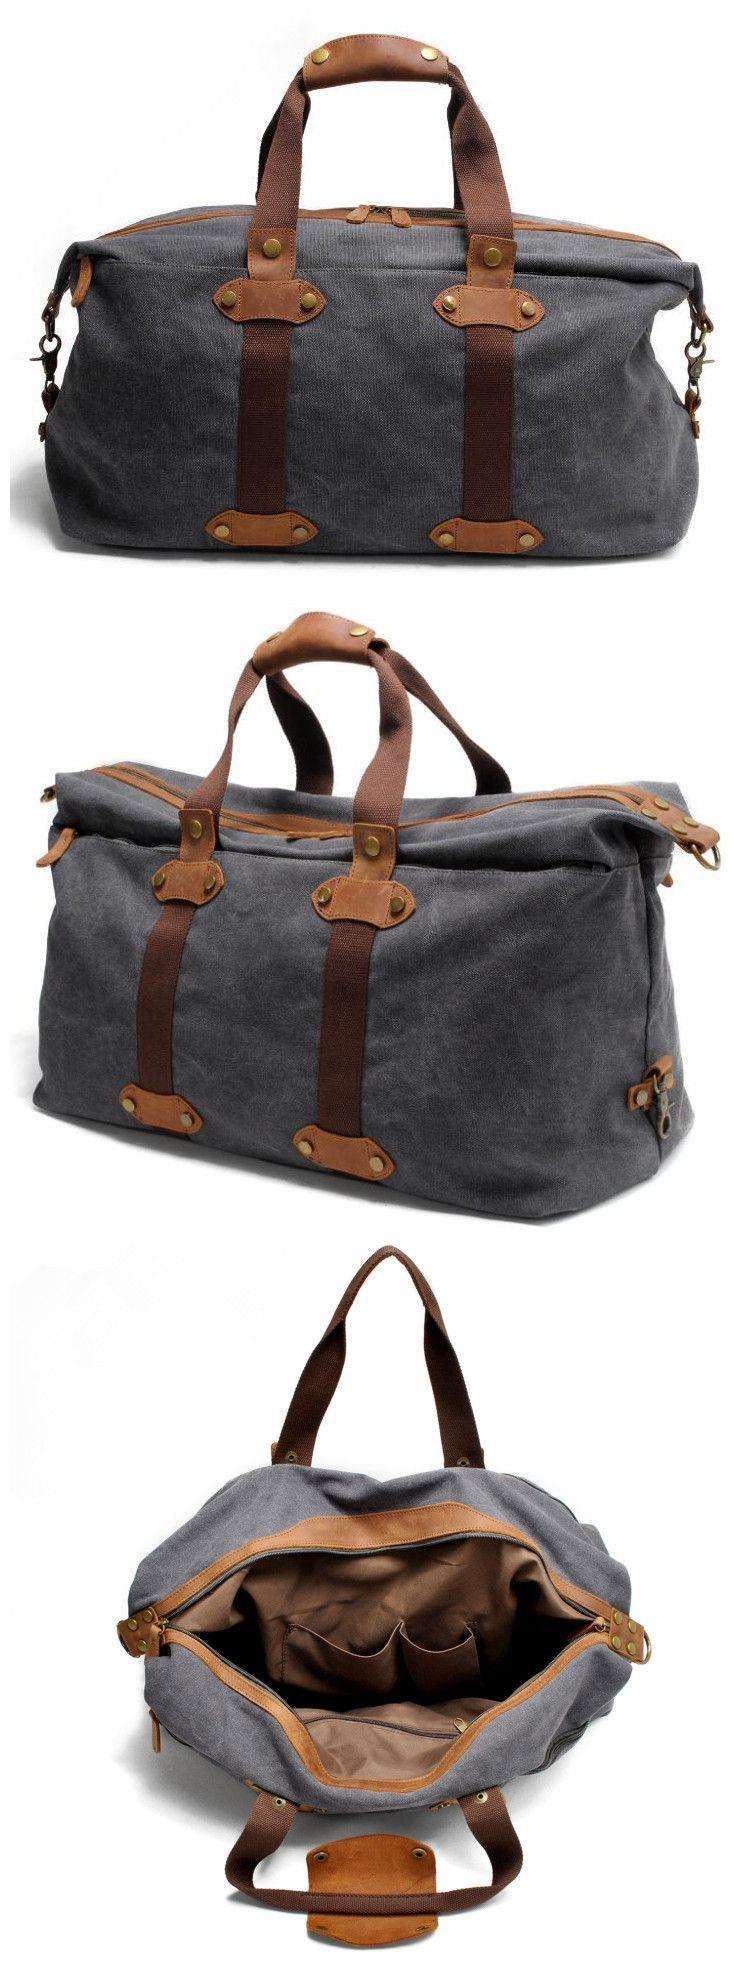 Waxed Canvas Leather Duffle Bag Overnight Bag Weekender Bag